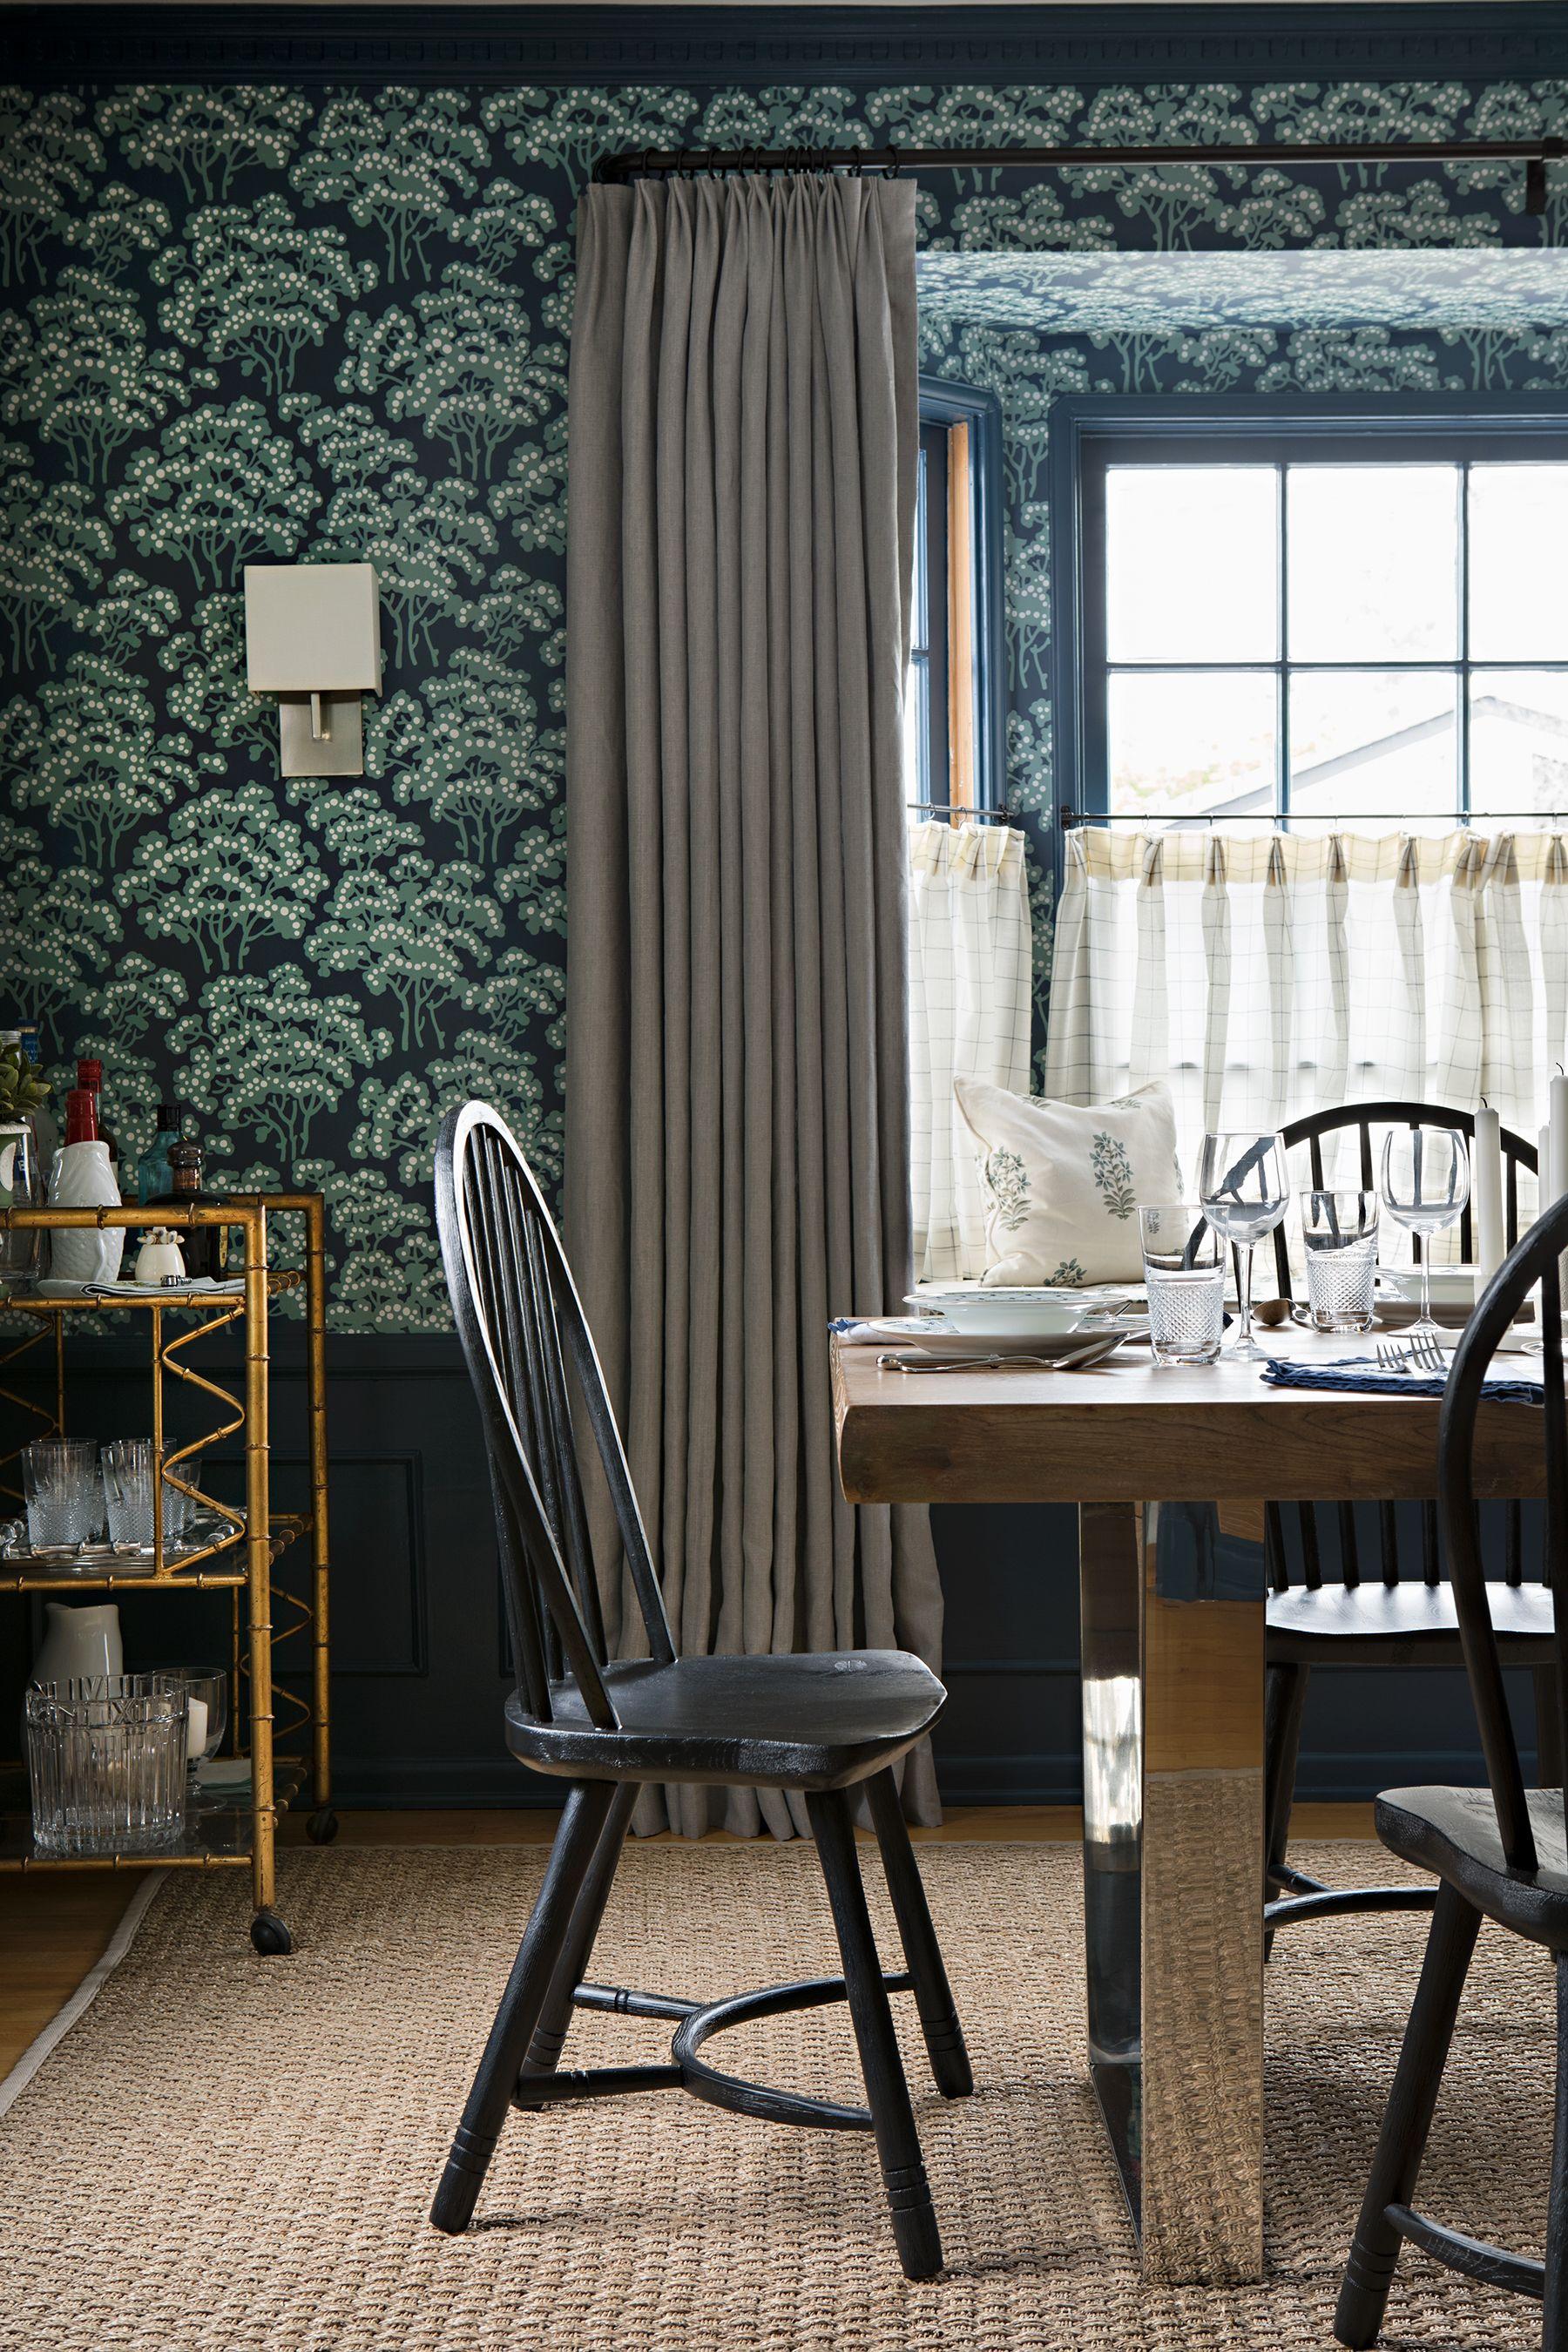 Merveilleux Dining Room Window Treatment Ideas